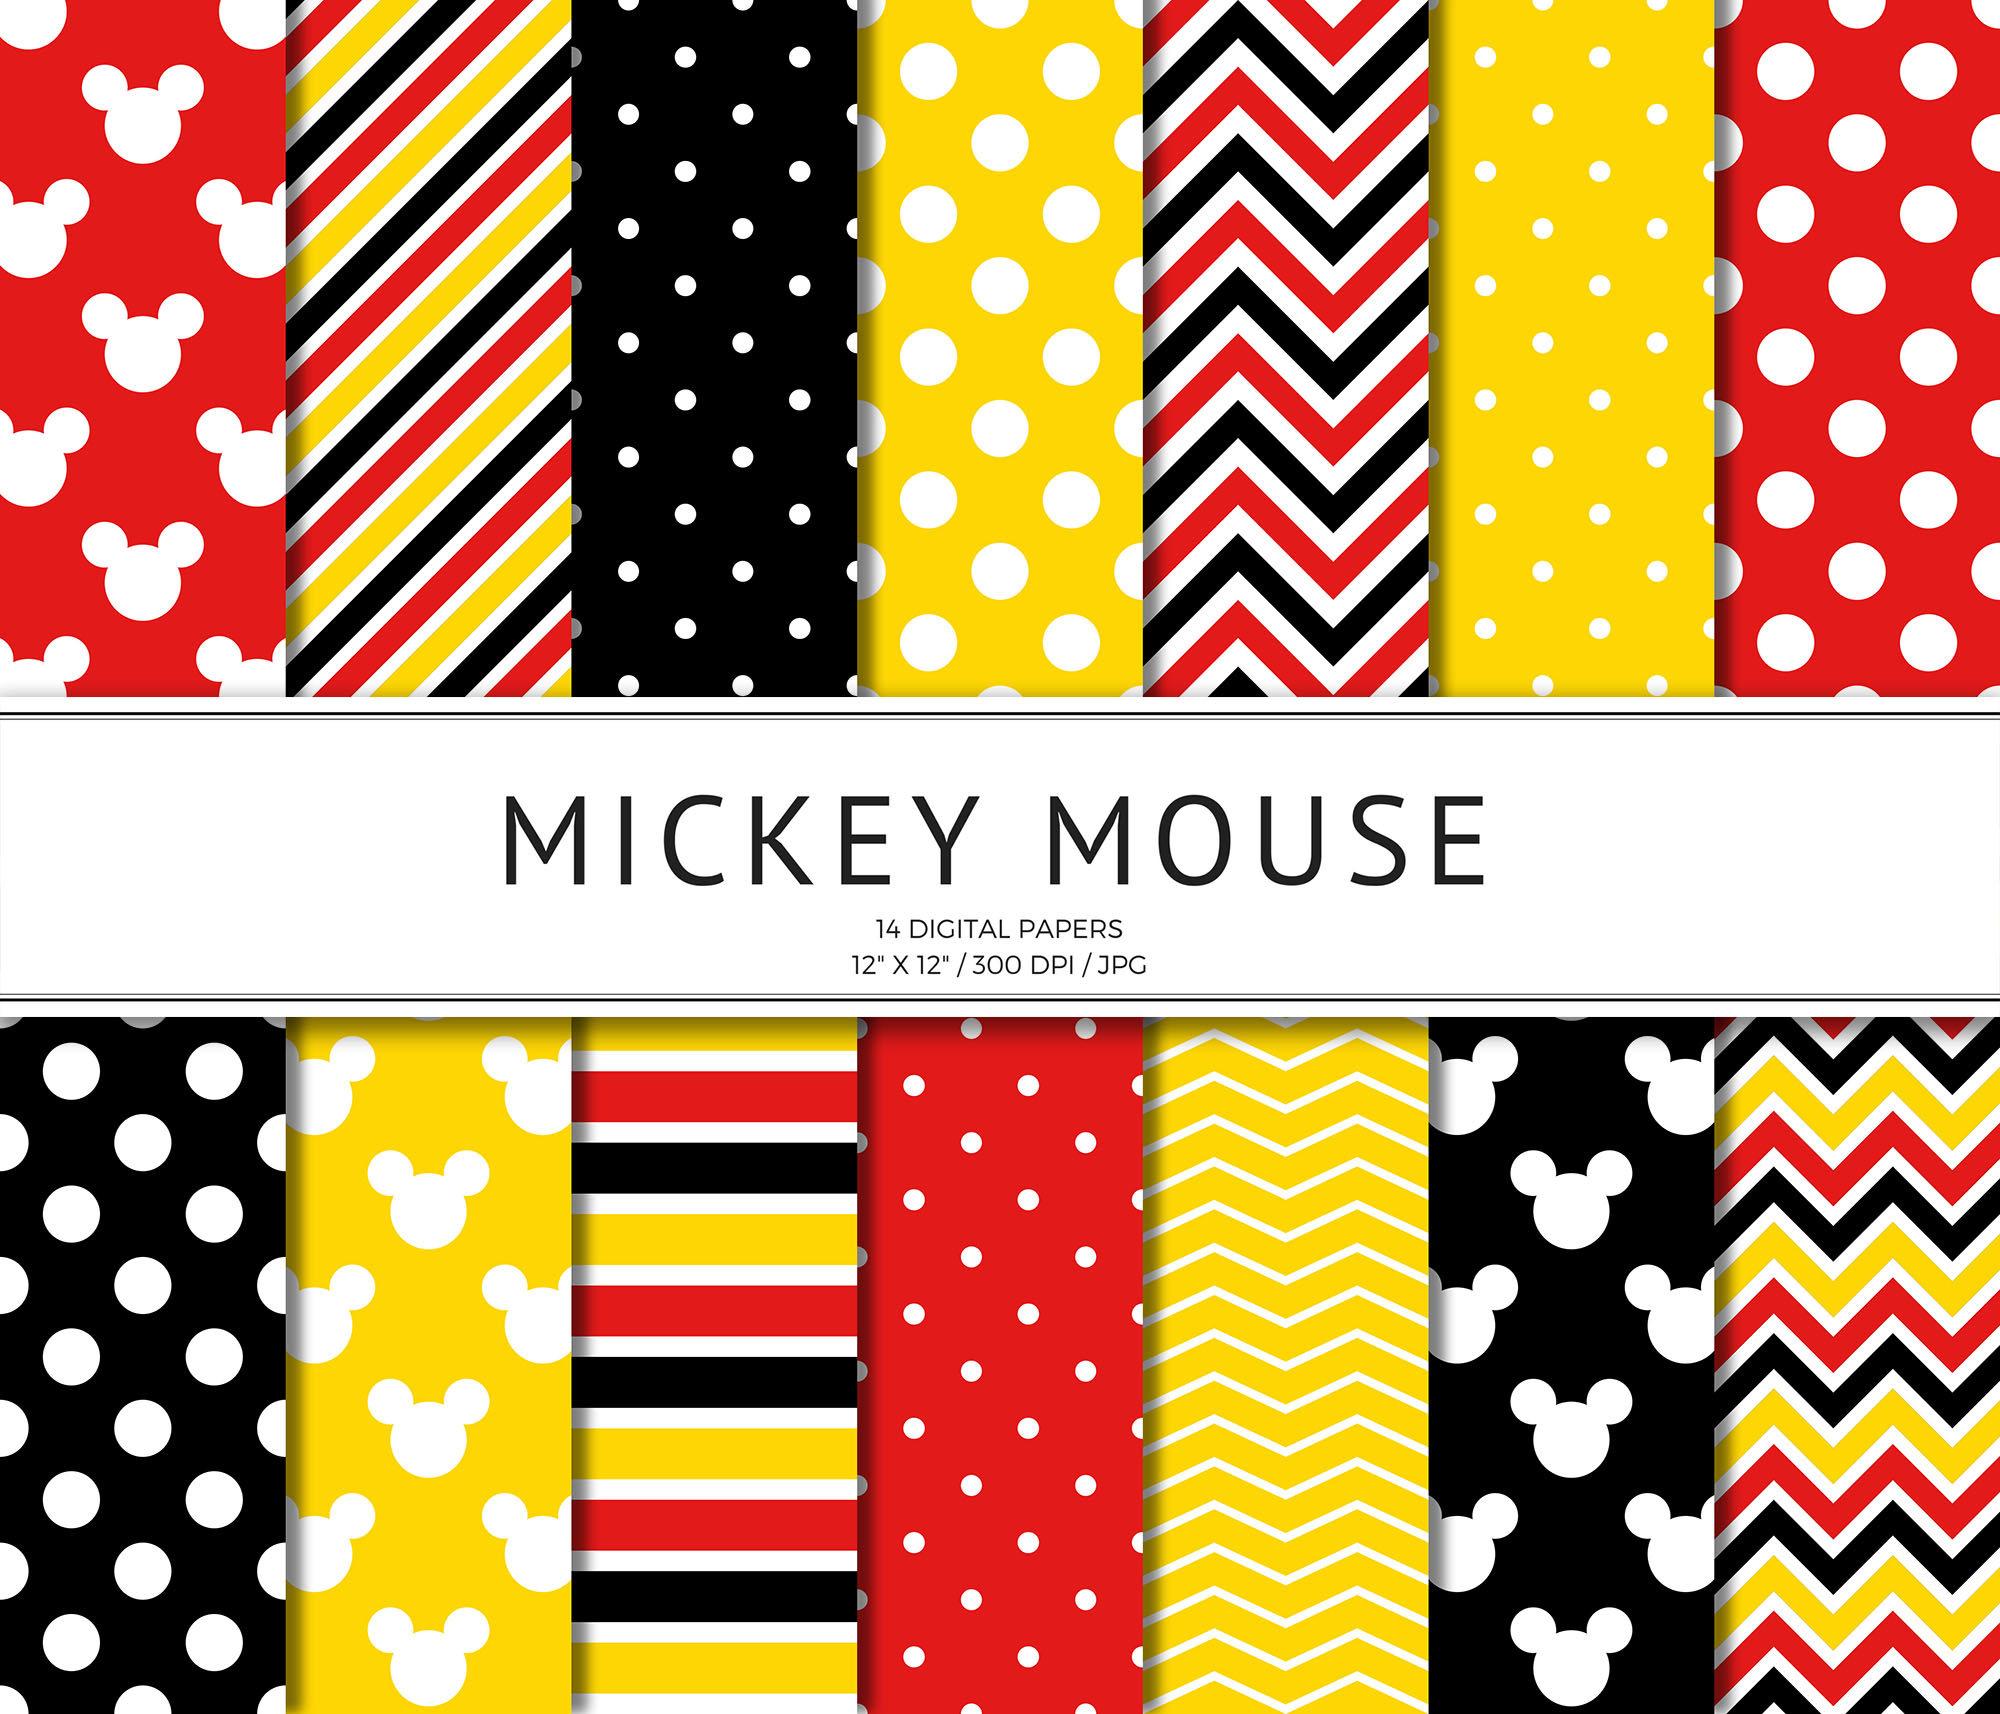 Mickey Mouse inspiriert digitales Papier Disney Scrapbook